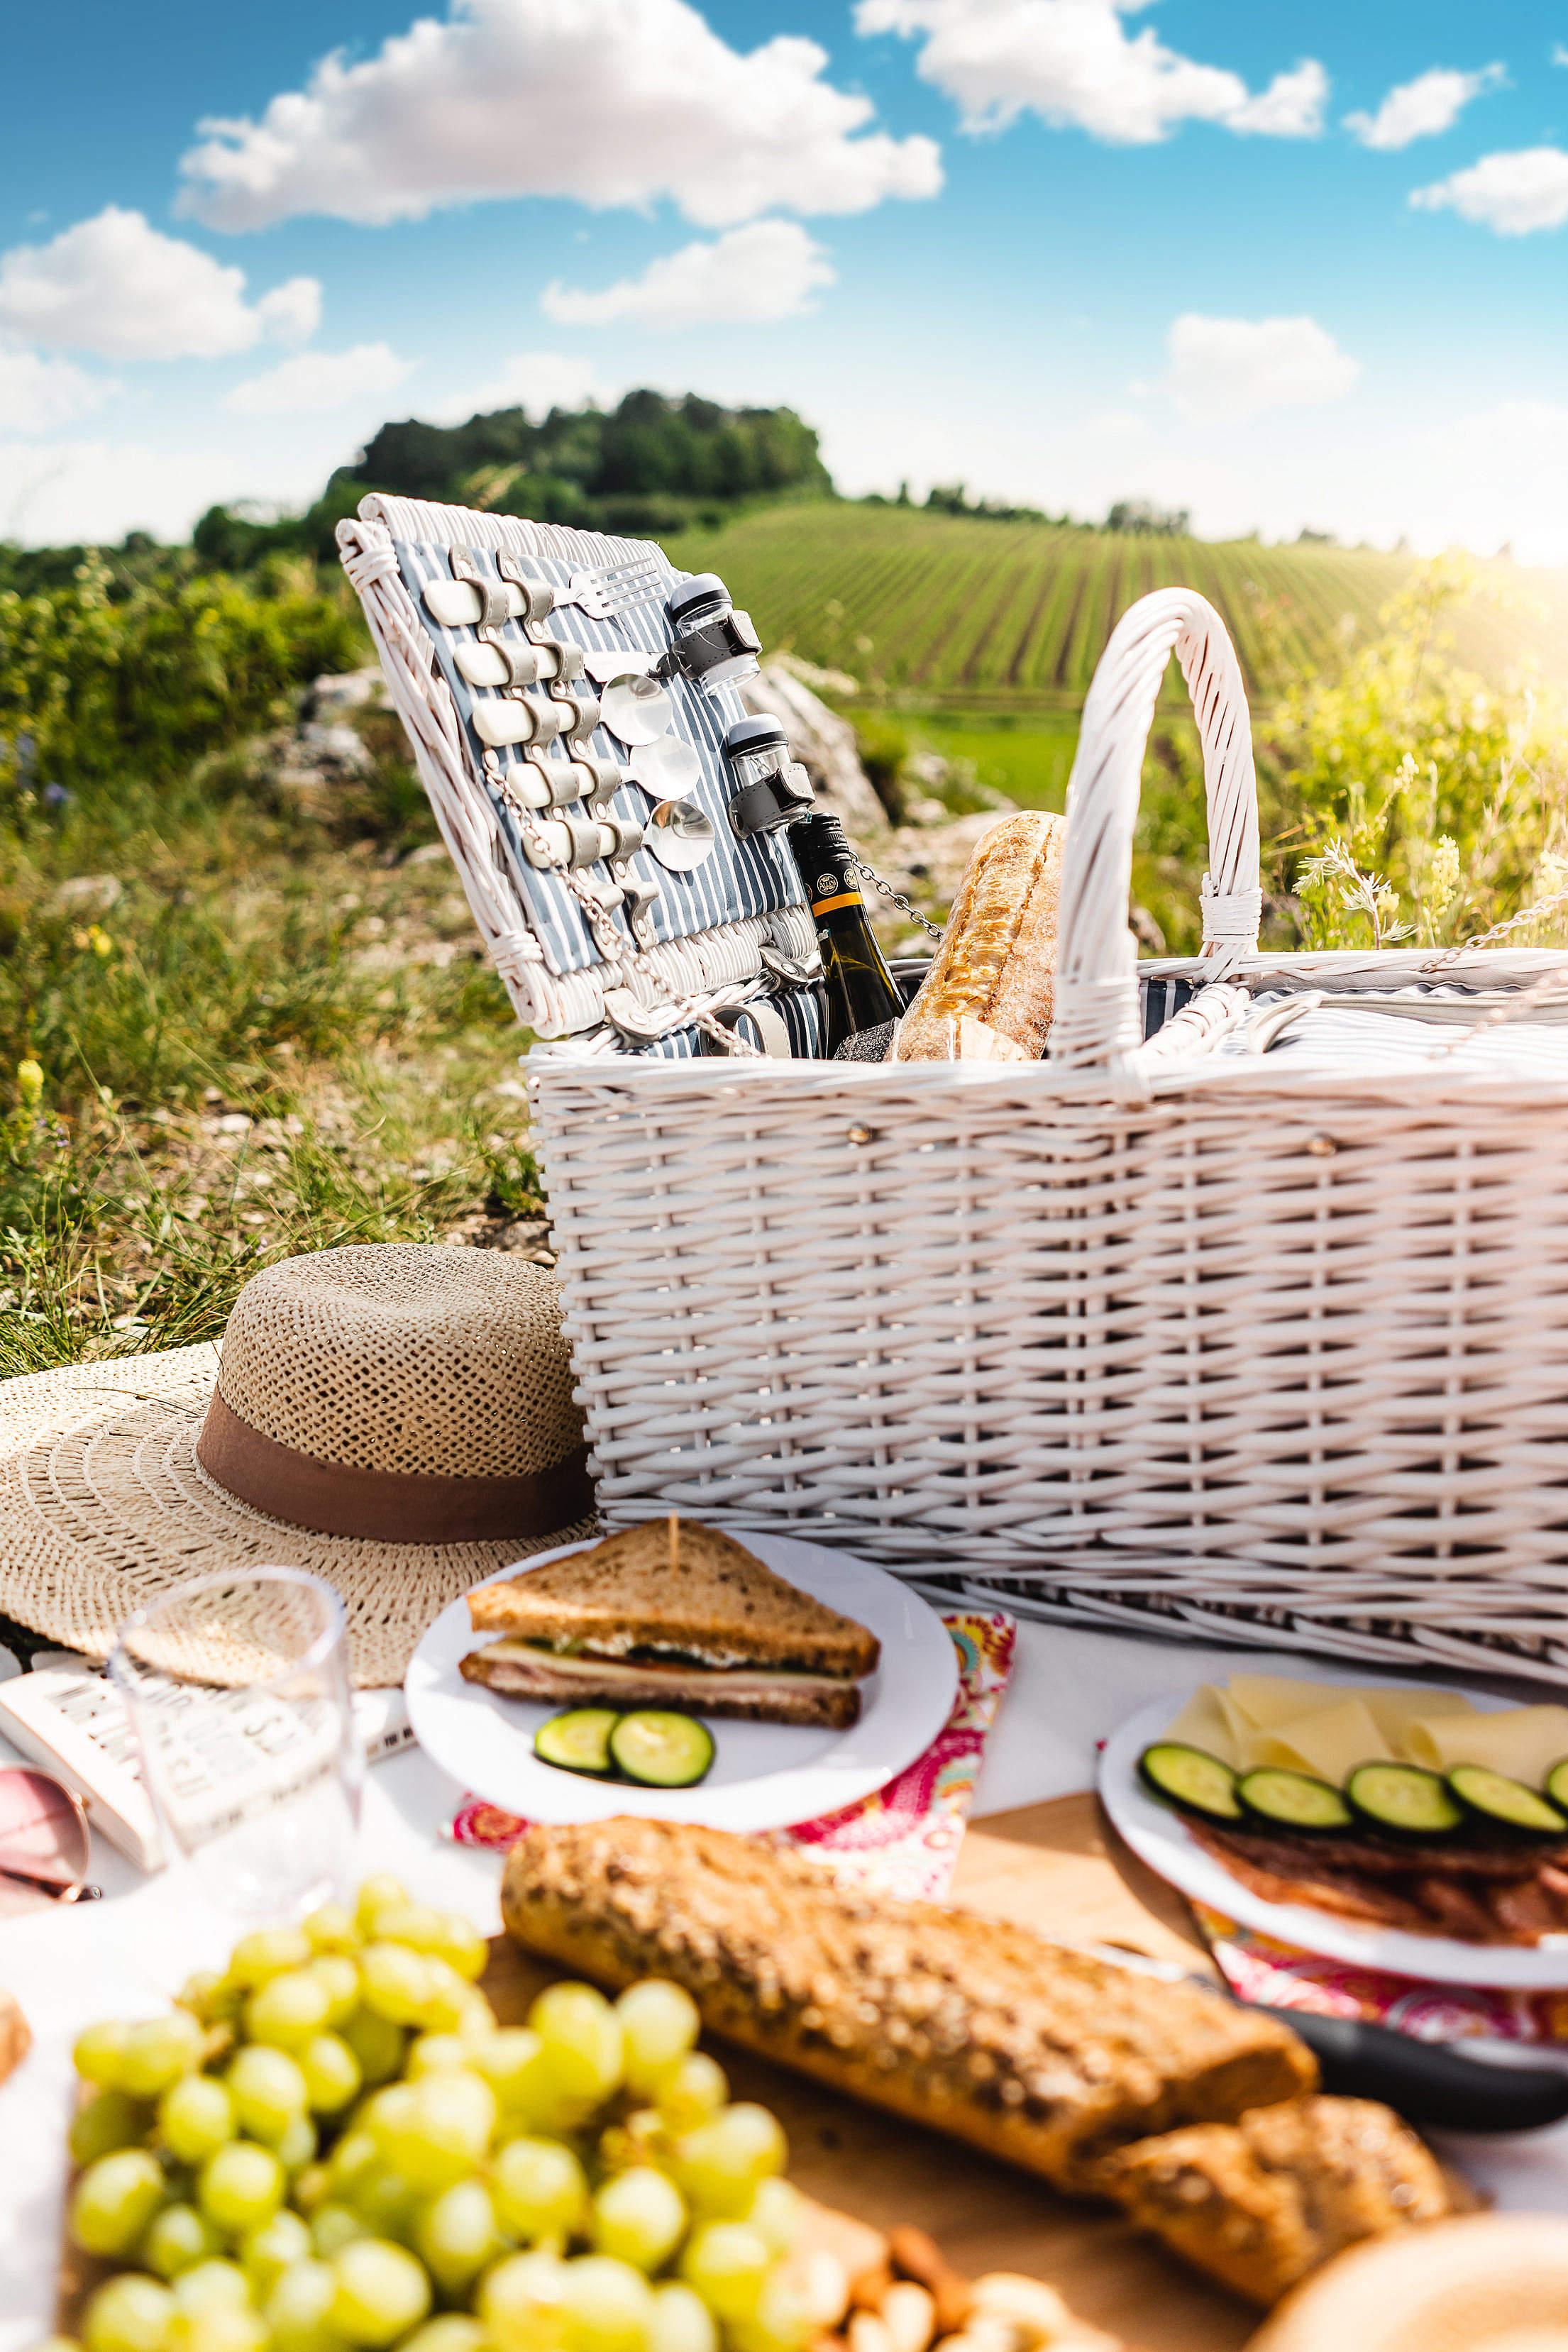 Picnic Basket Free Stock Photo